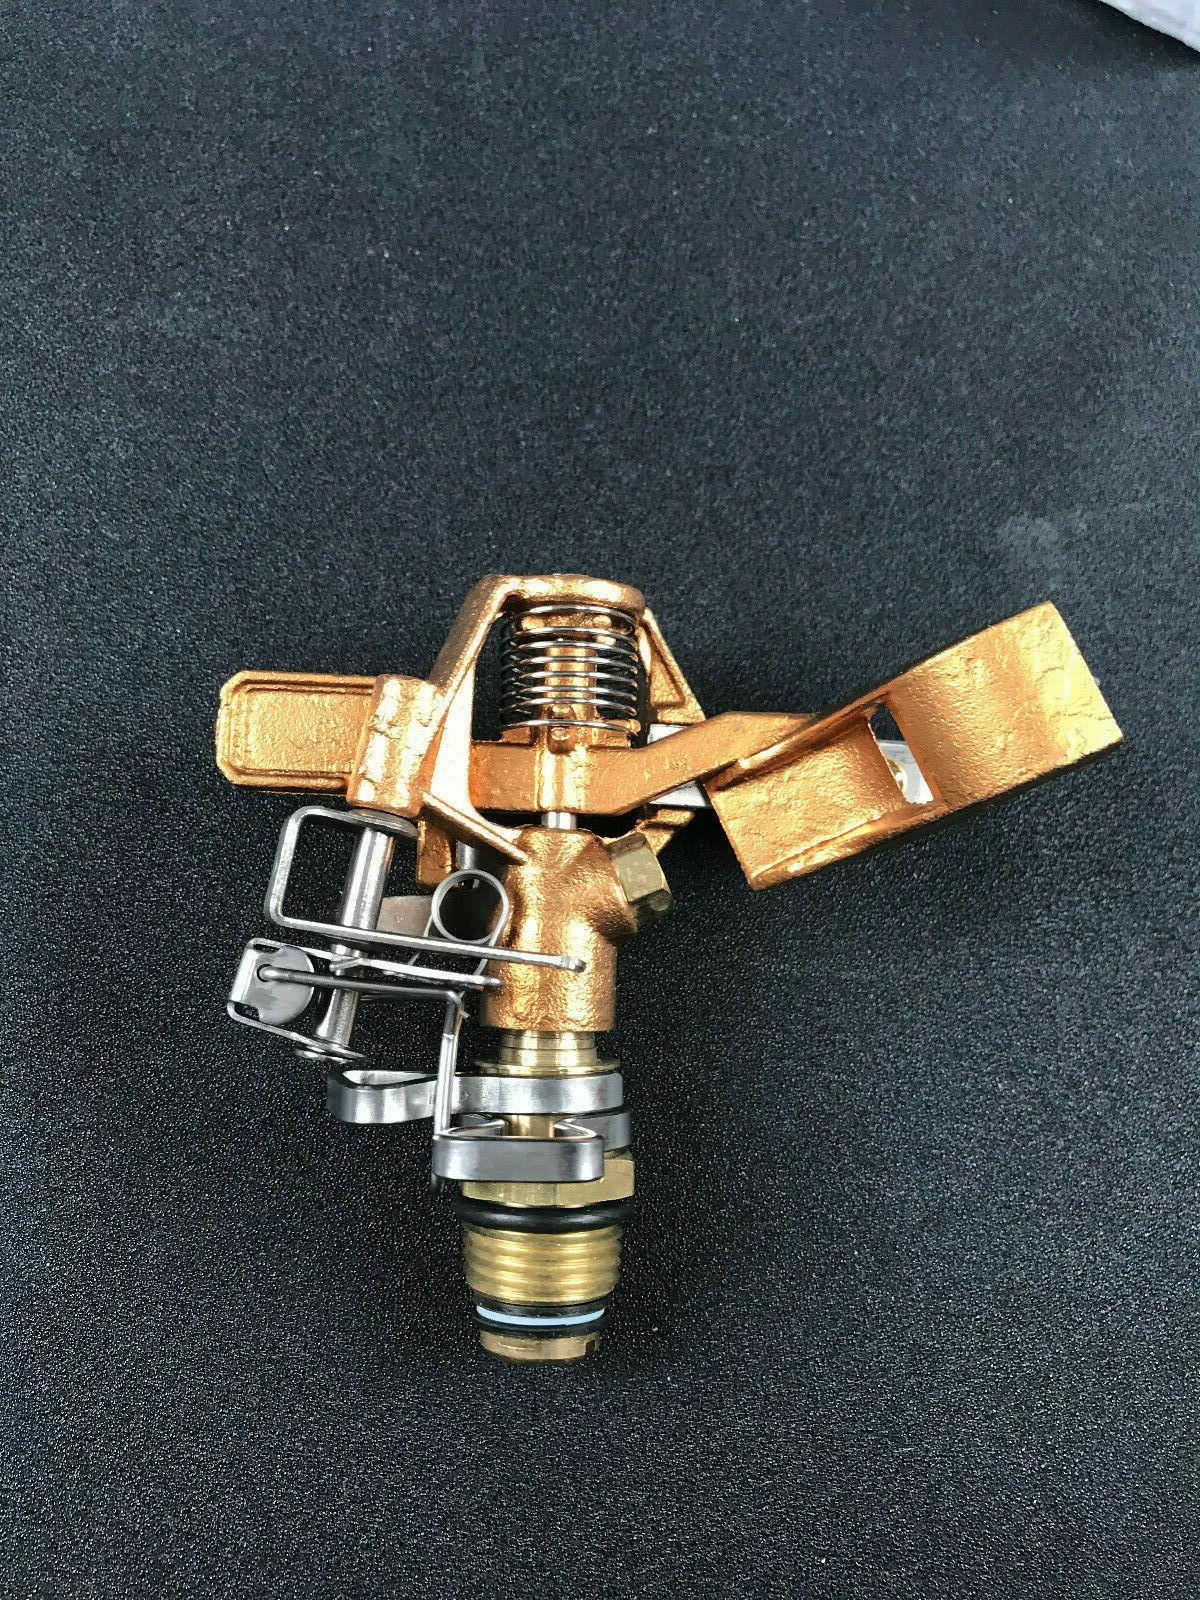 A5001T Impact Head Sprinkler Degree 20-40' 5000